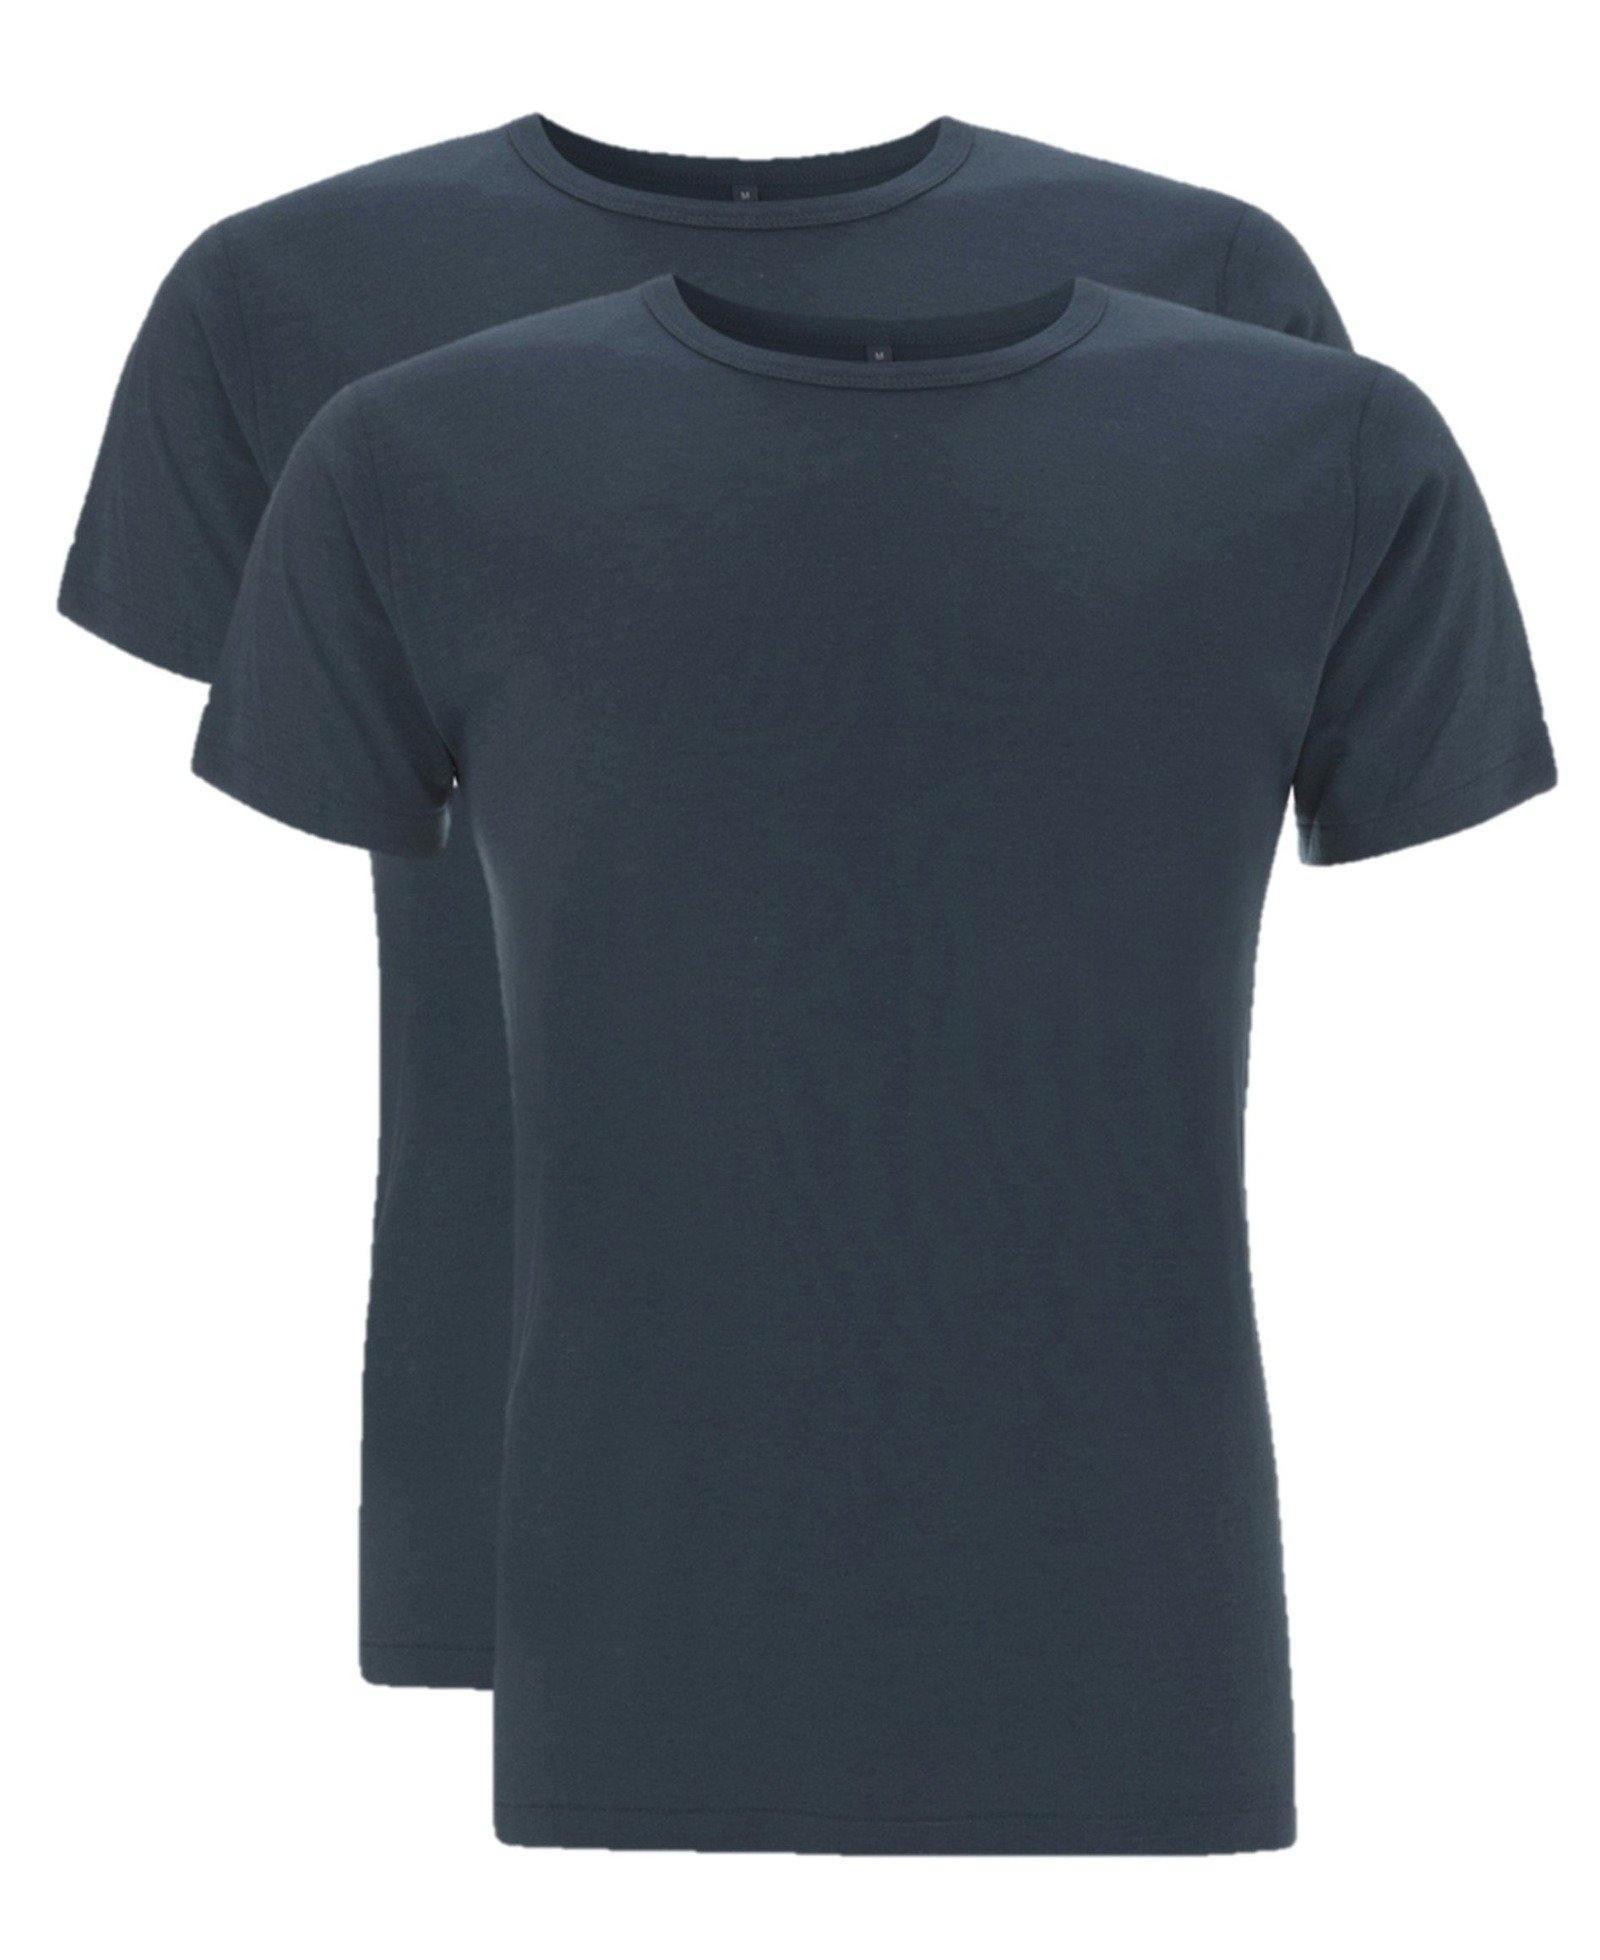 Bamboe t-shirt heren 2-pack | Cayboo